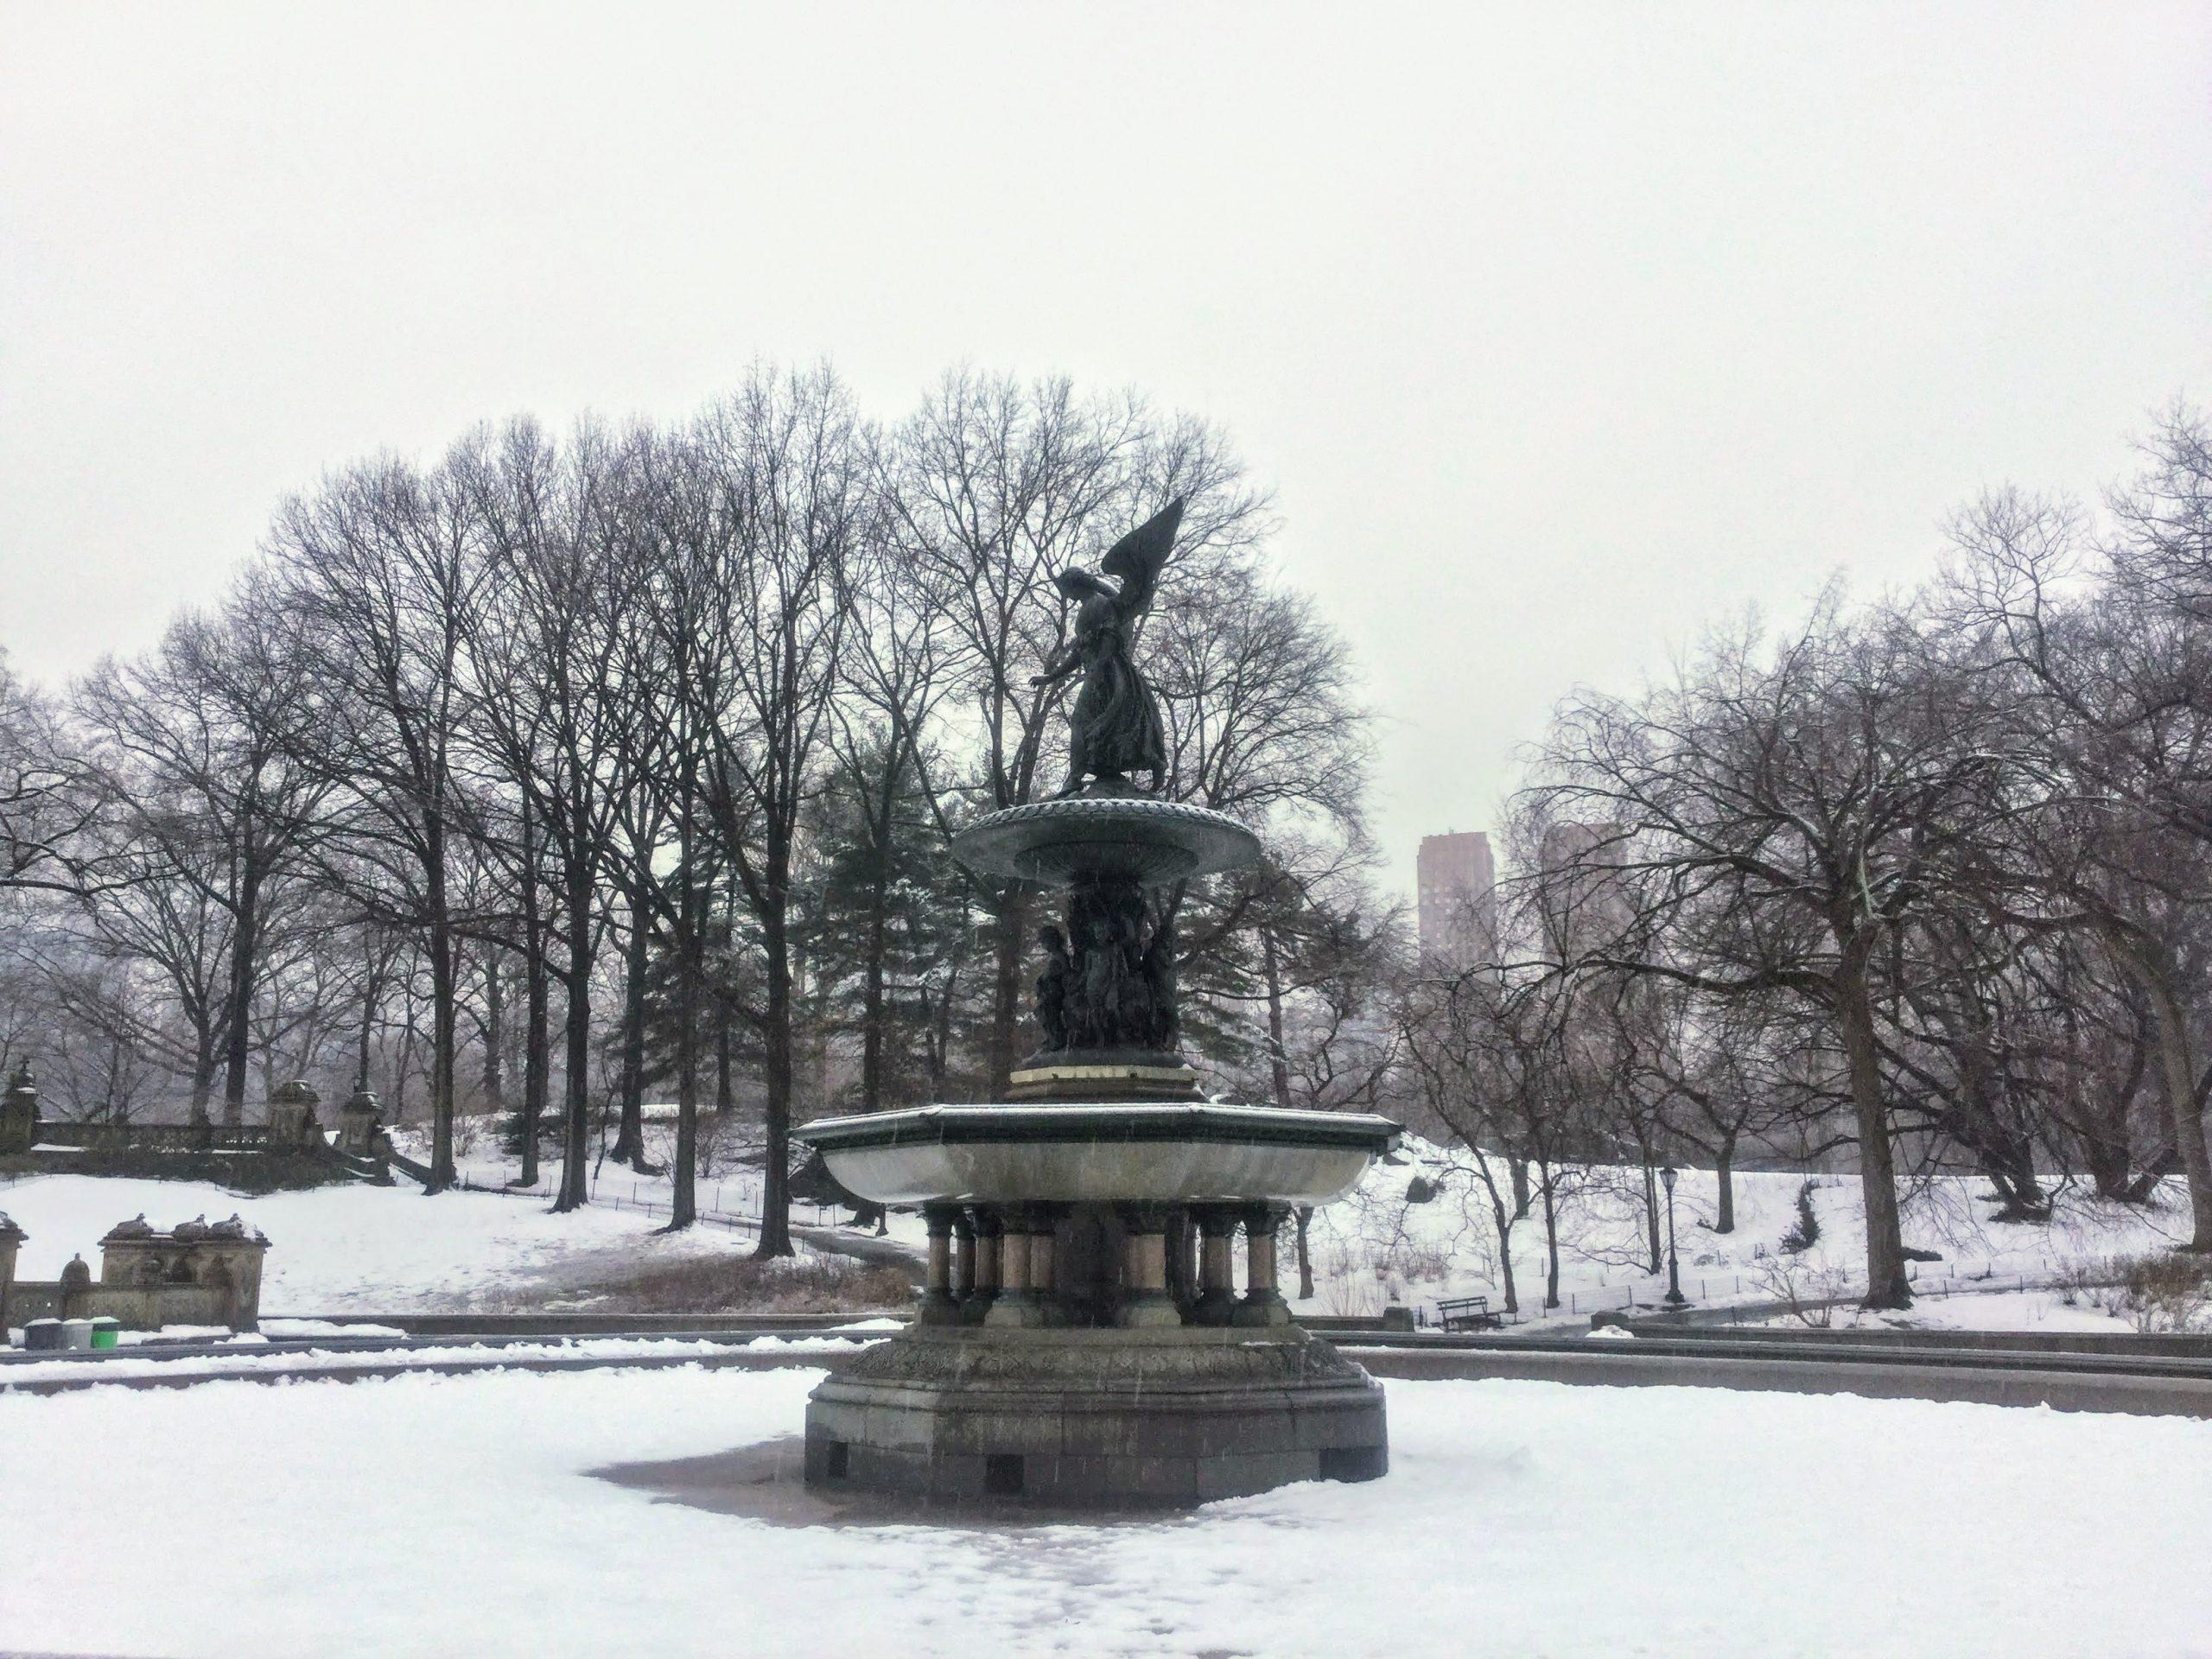 Bethesda Fountain in the snow